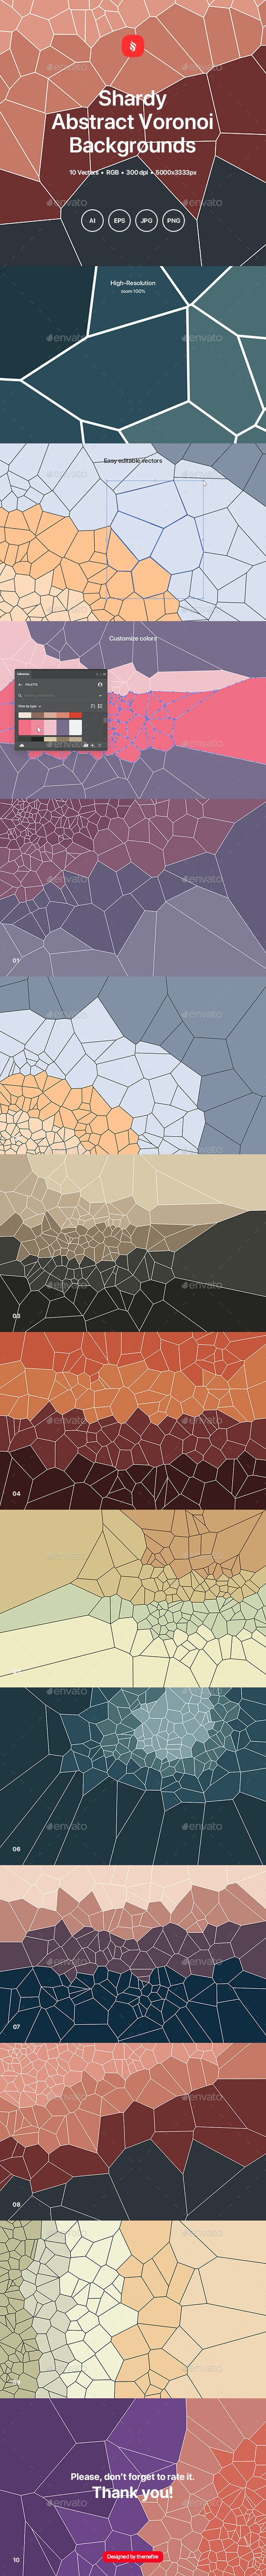 Shardy - Voronoi Background Set - Abstract Backgrounds